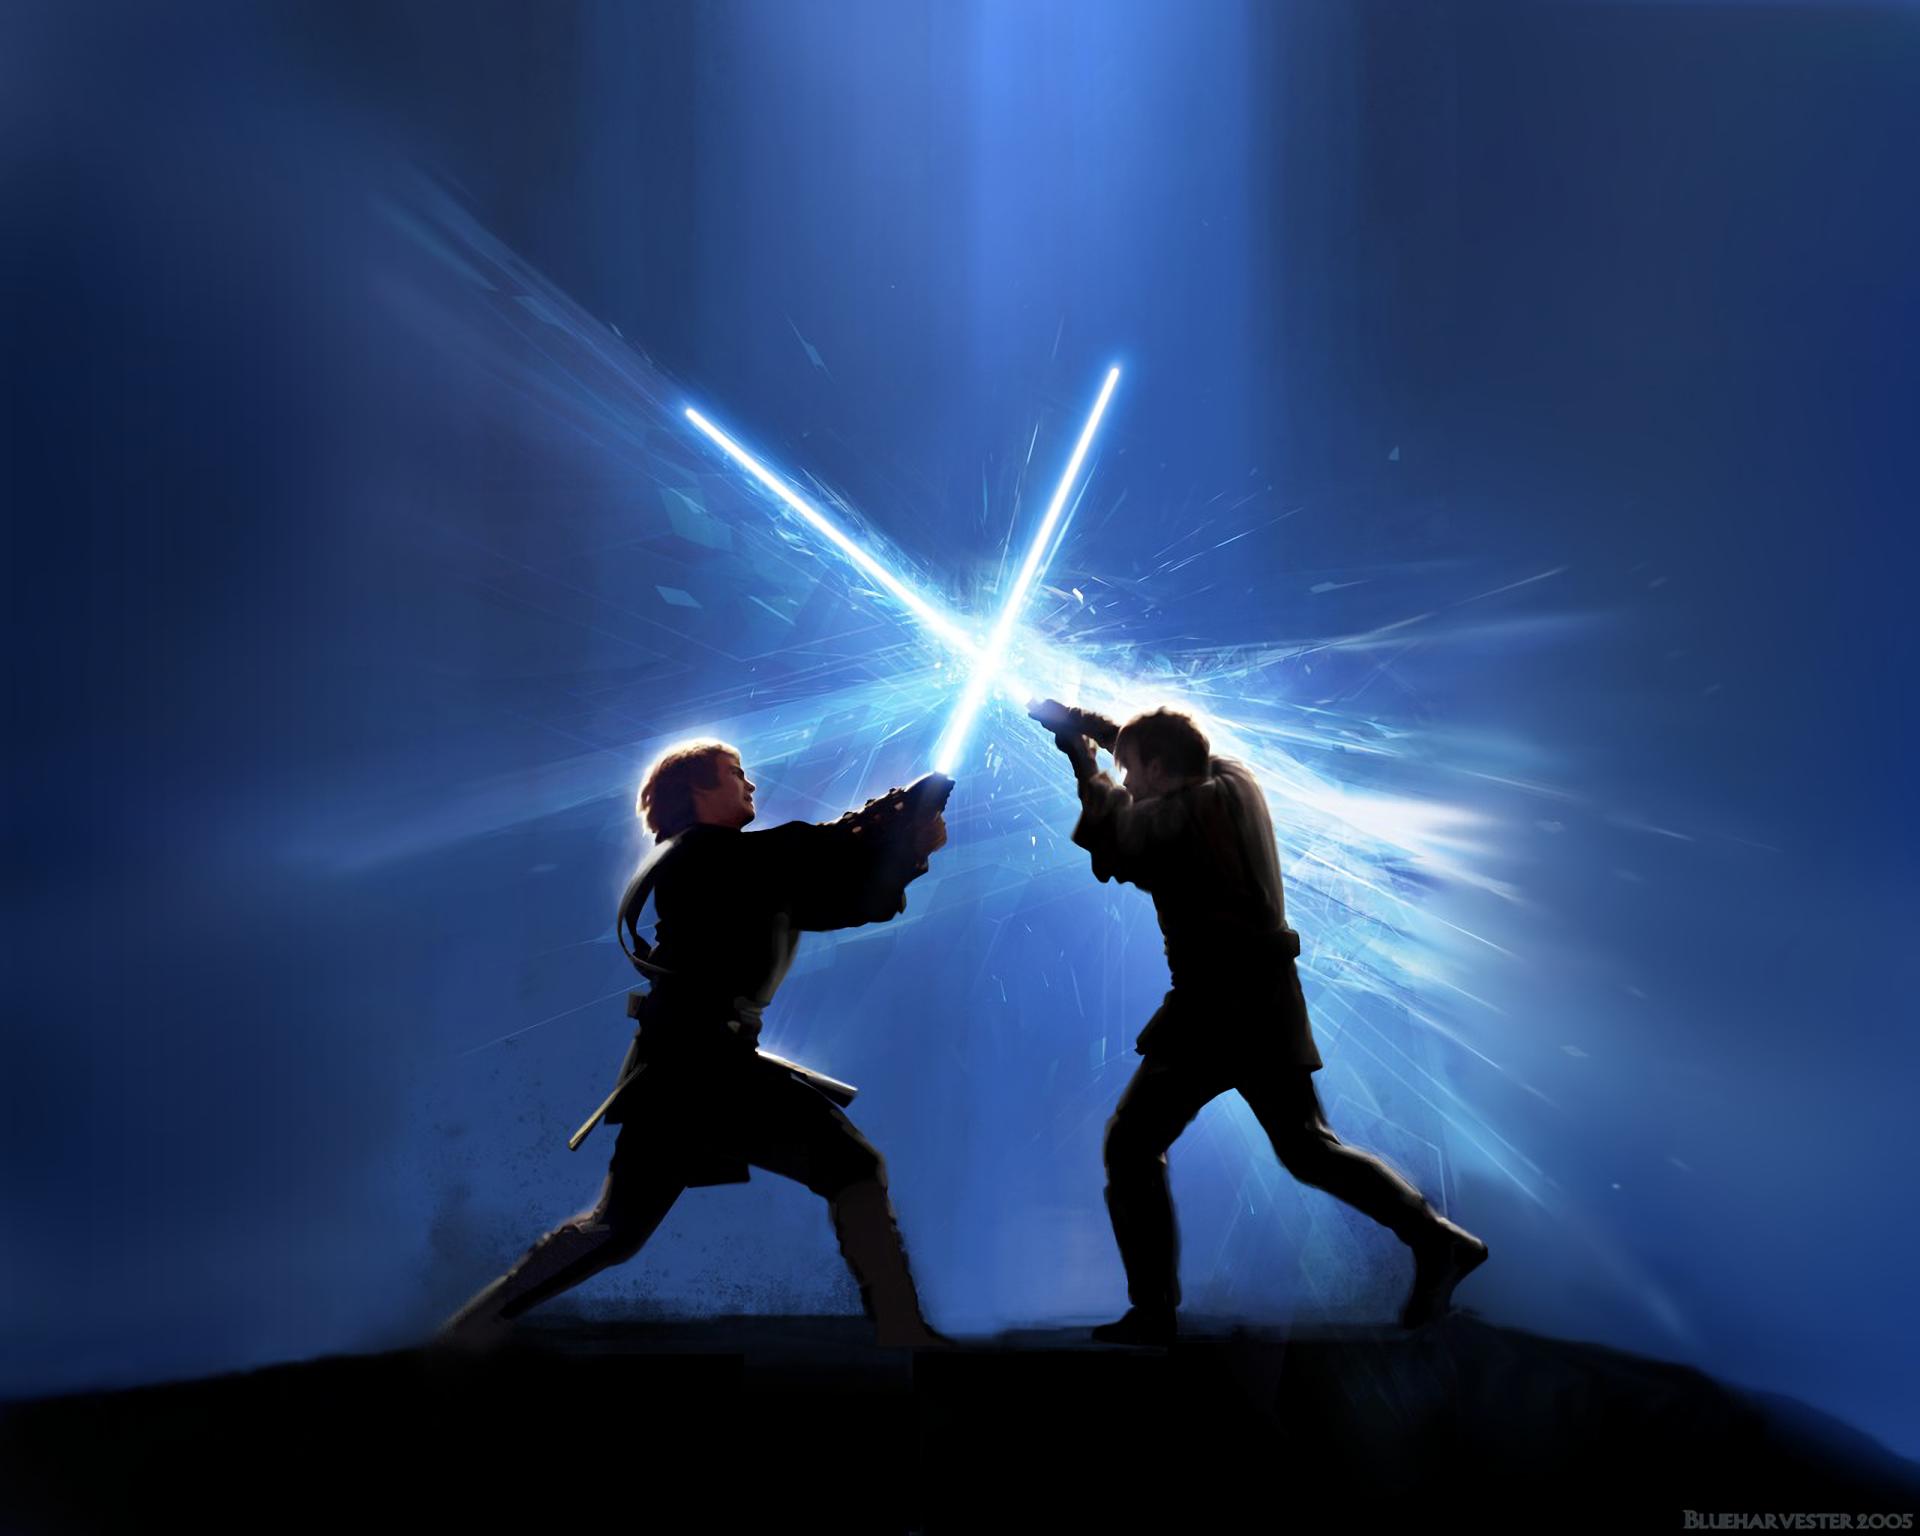 Wallpaper Star Wars Jedi Laser Swords Darth Vader Anakin